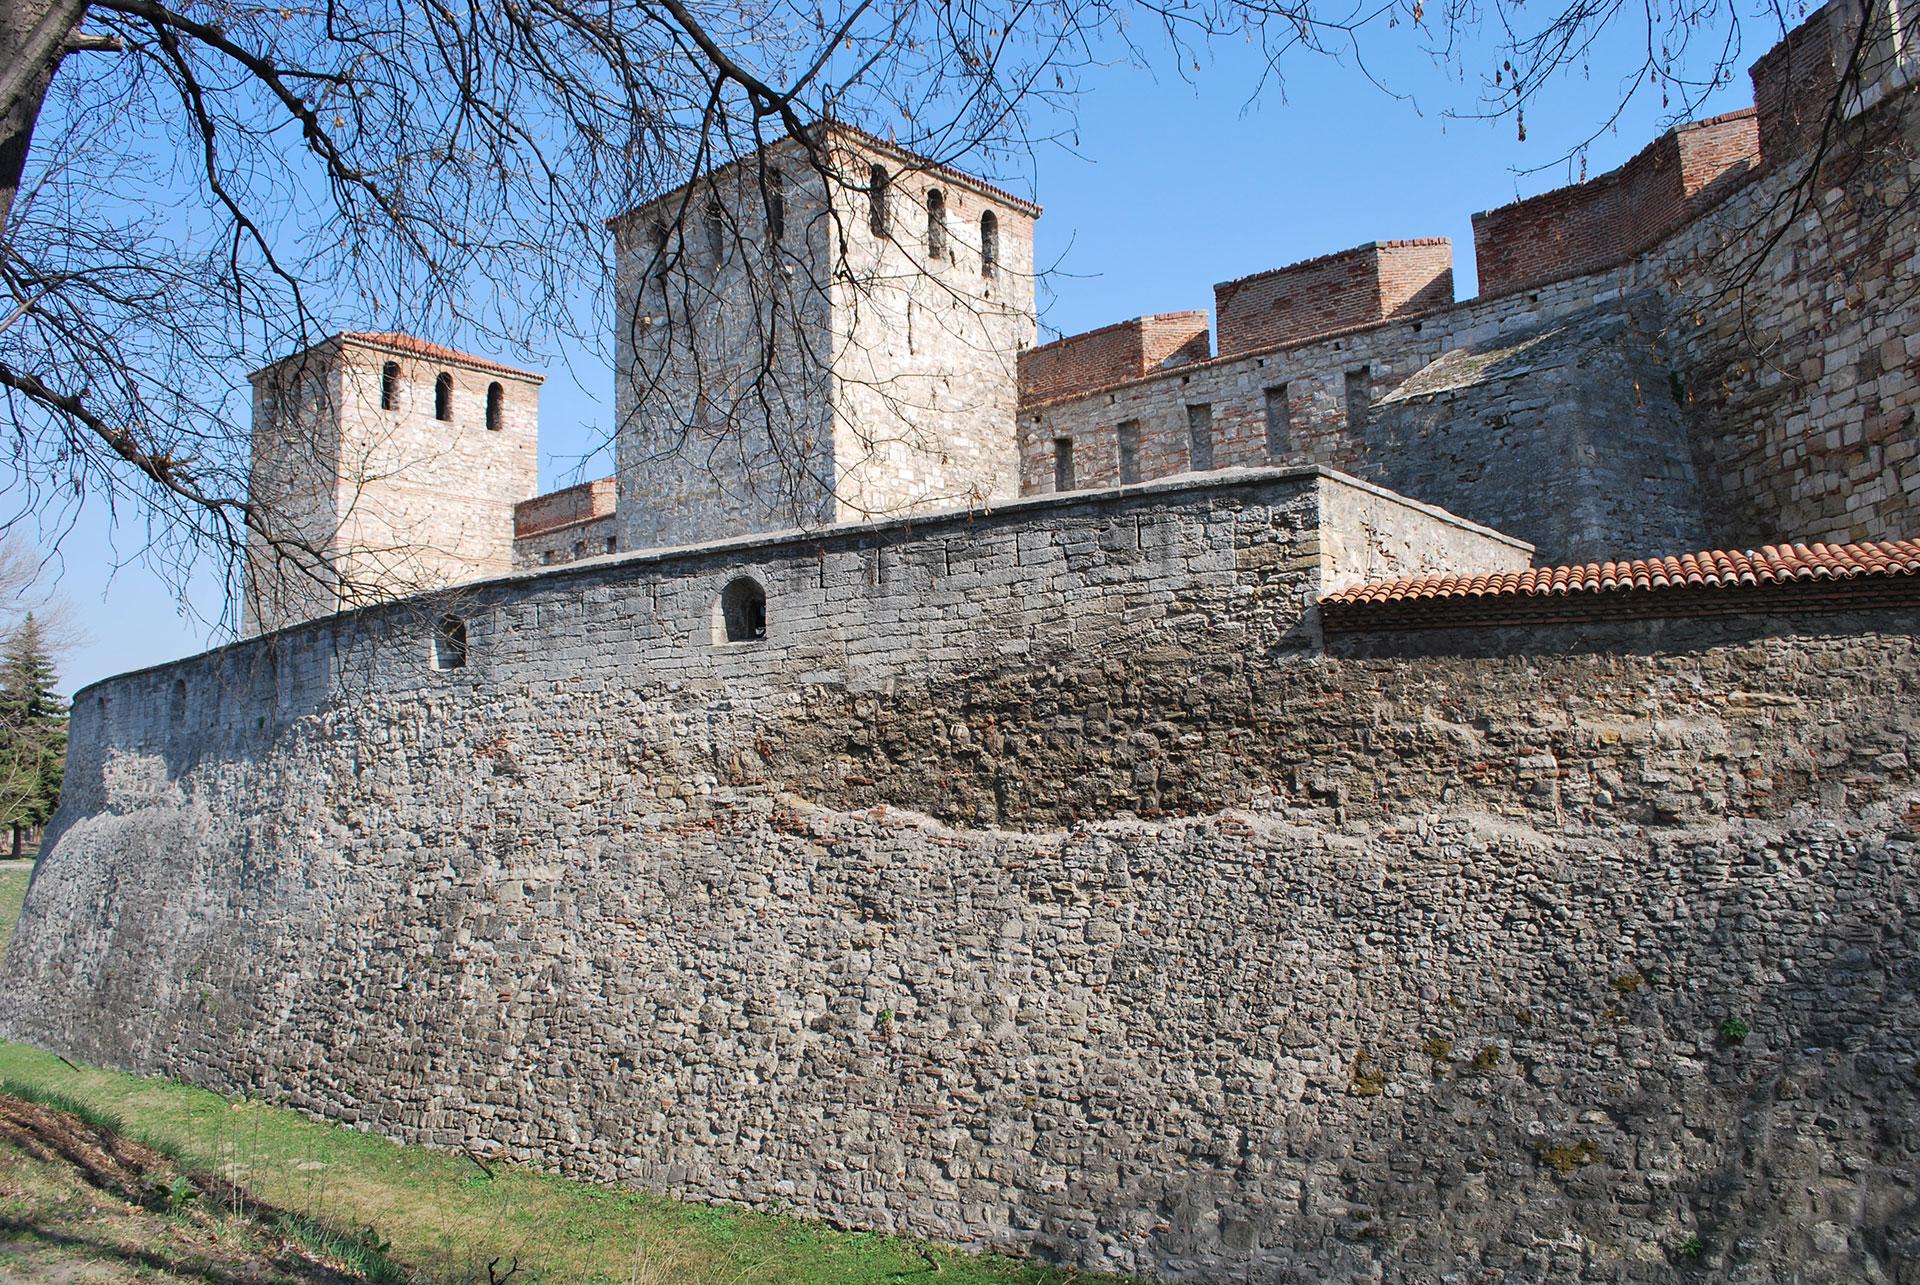 Mediaeval-Bulgarian-Fortress-Baba-Vida_21